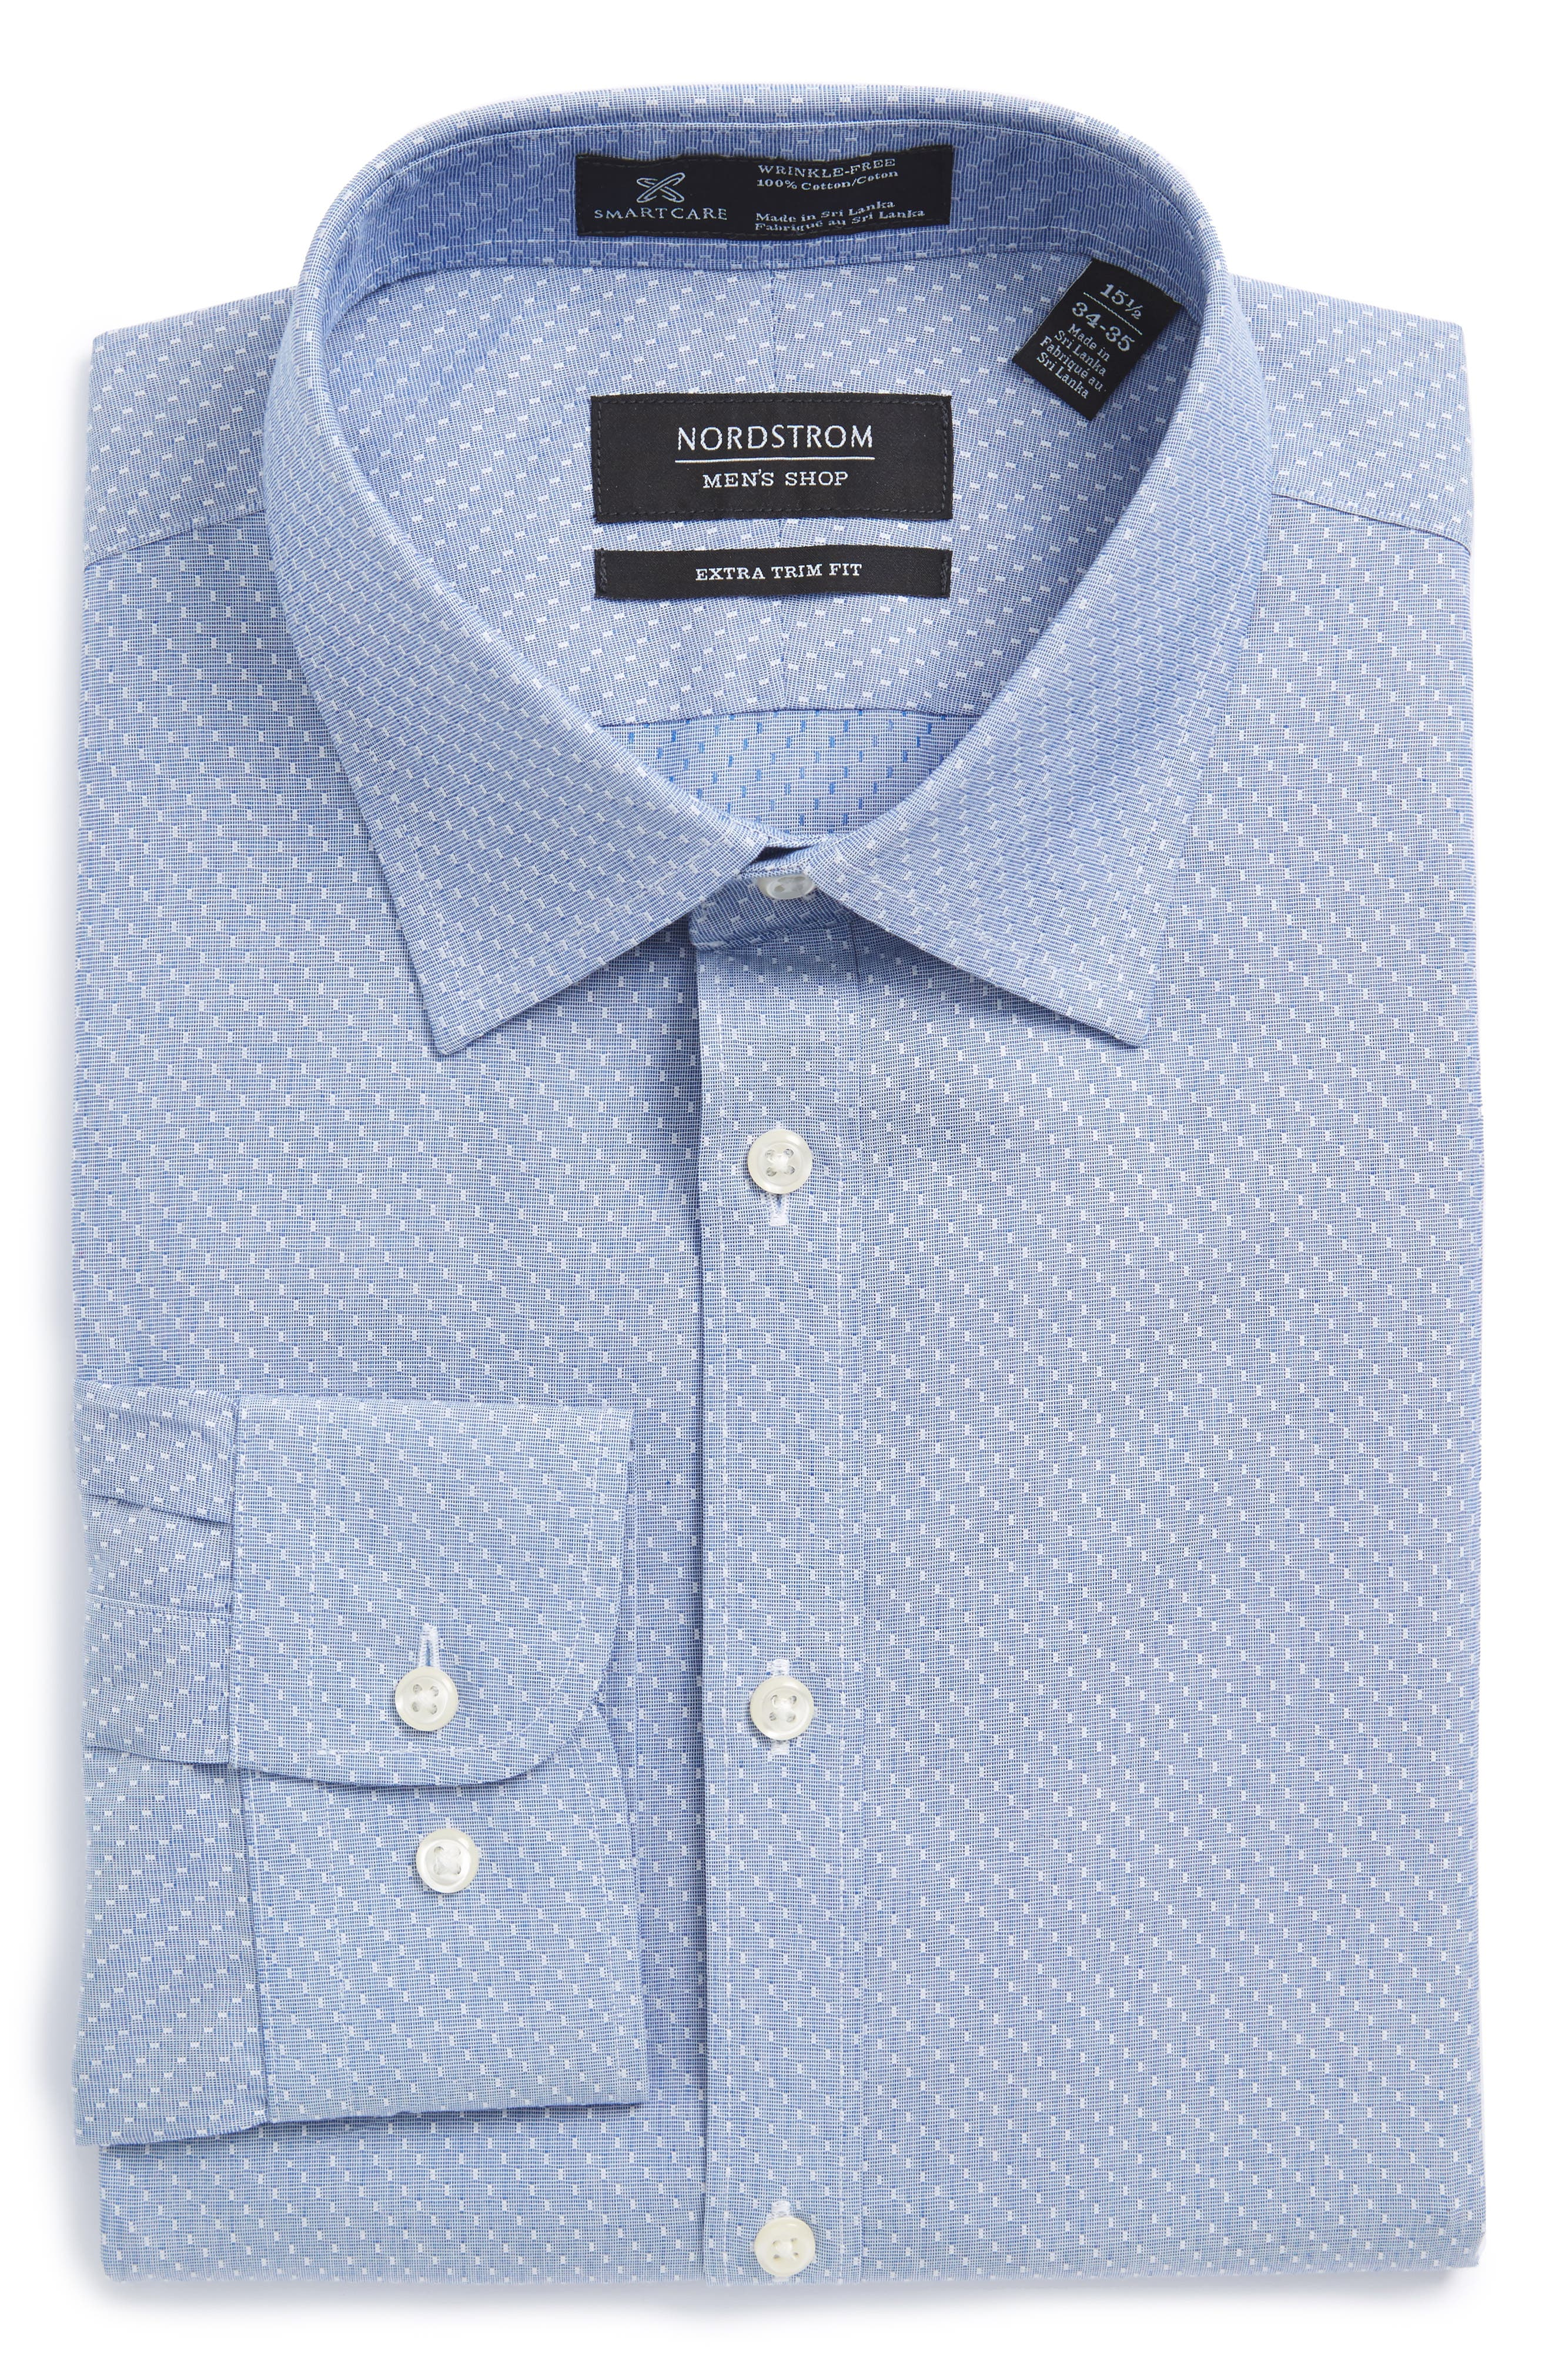 Nordstrom Men's Shop Smartcare™ Extra Trim Fit Dobby Dress Shirt